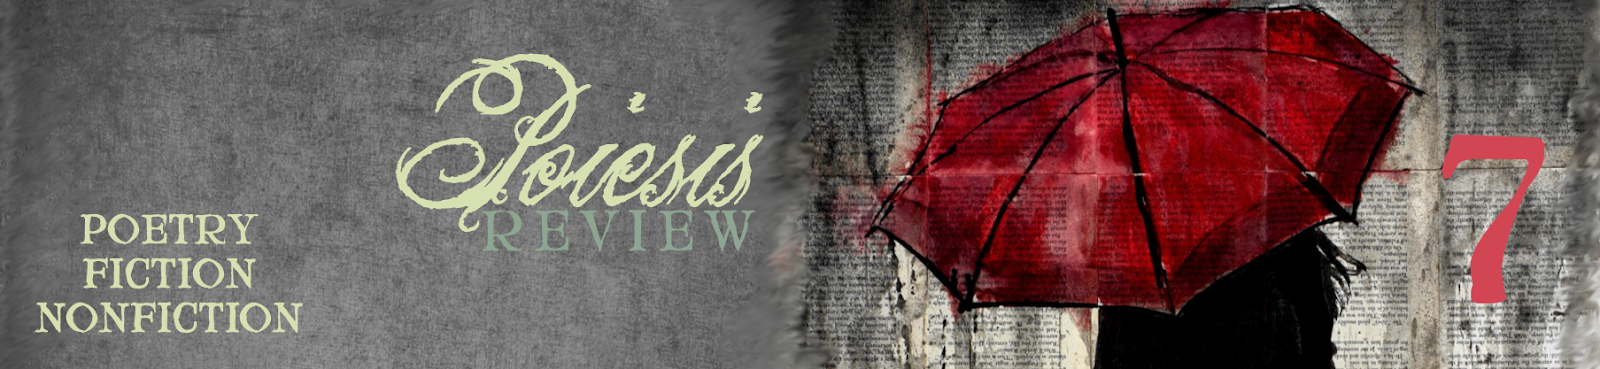 Poiesis Review 7 header banner